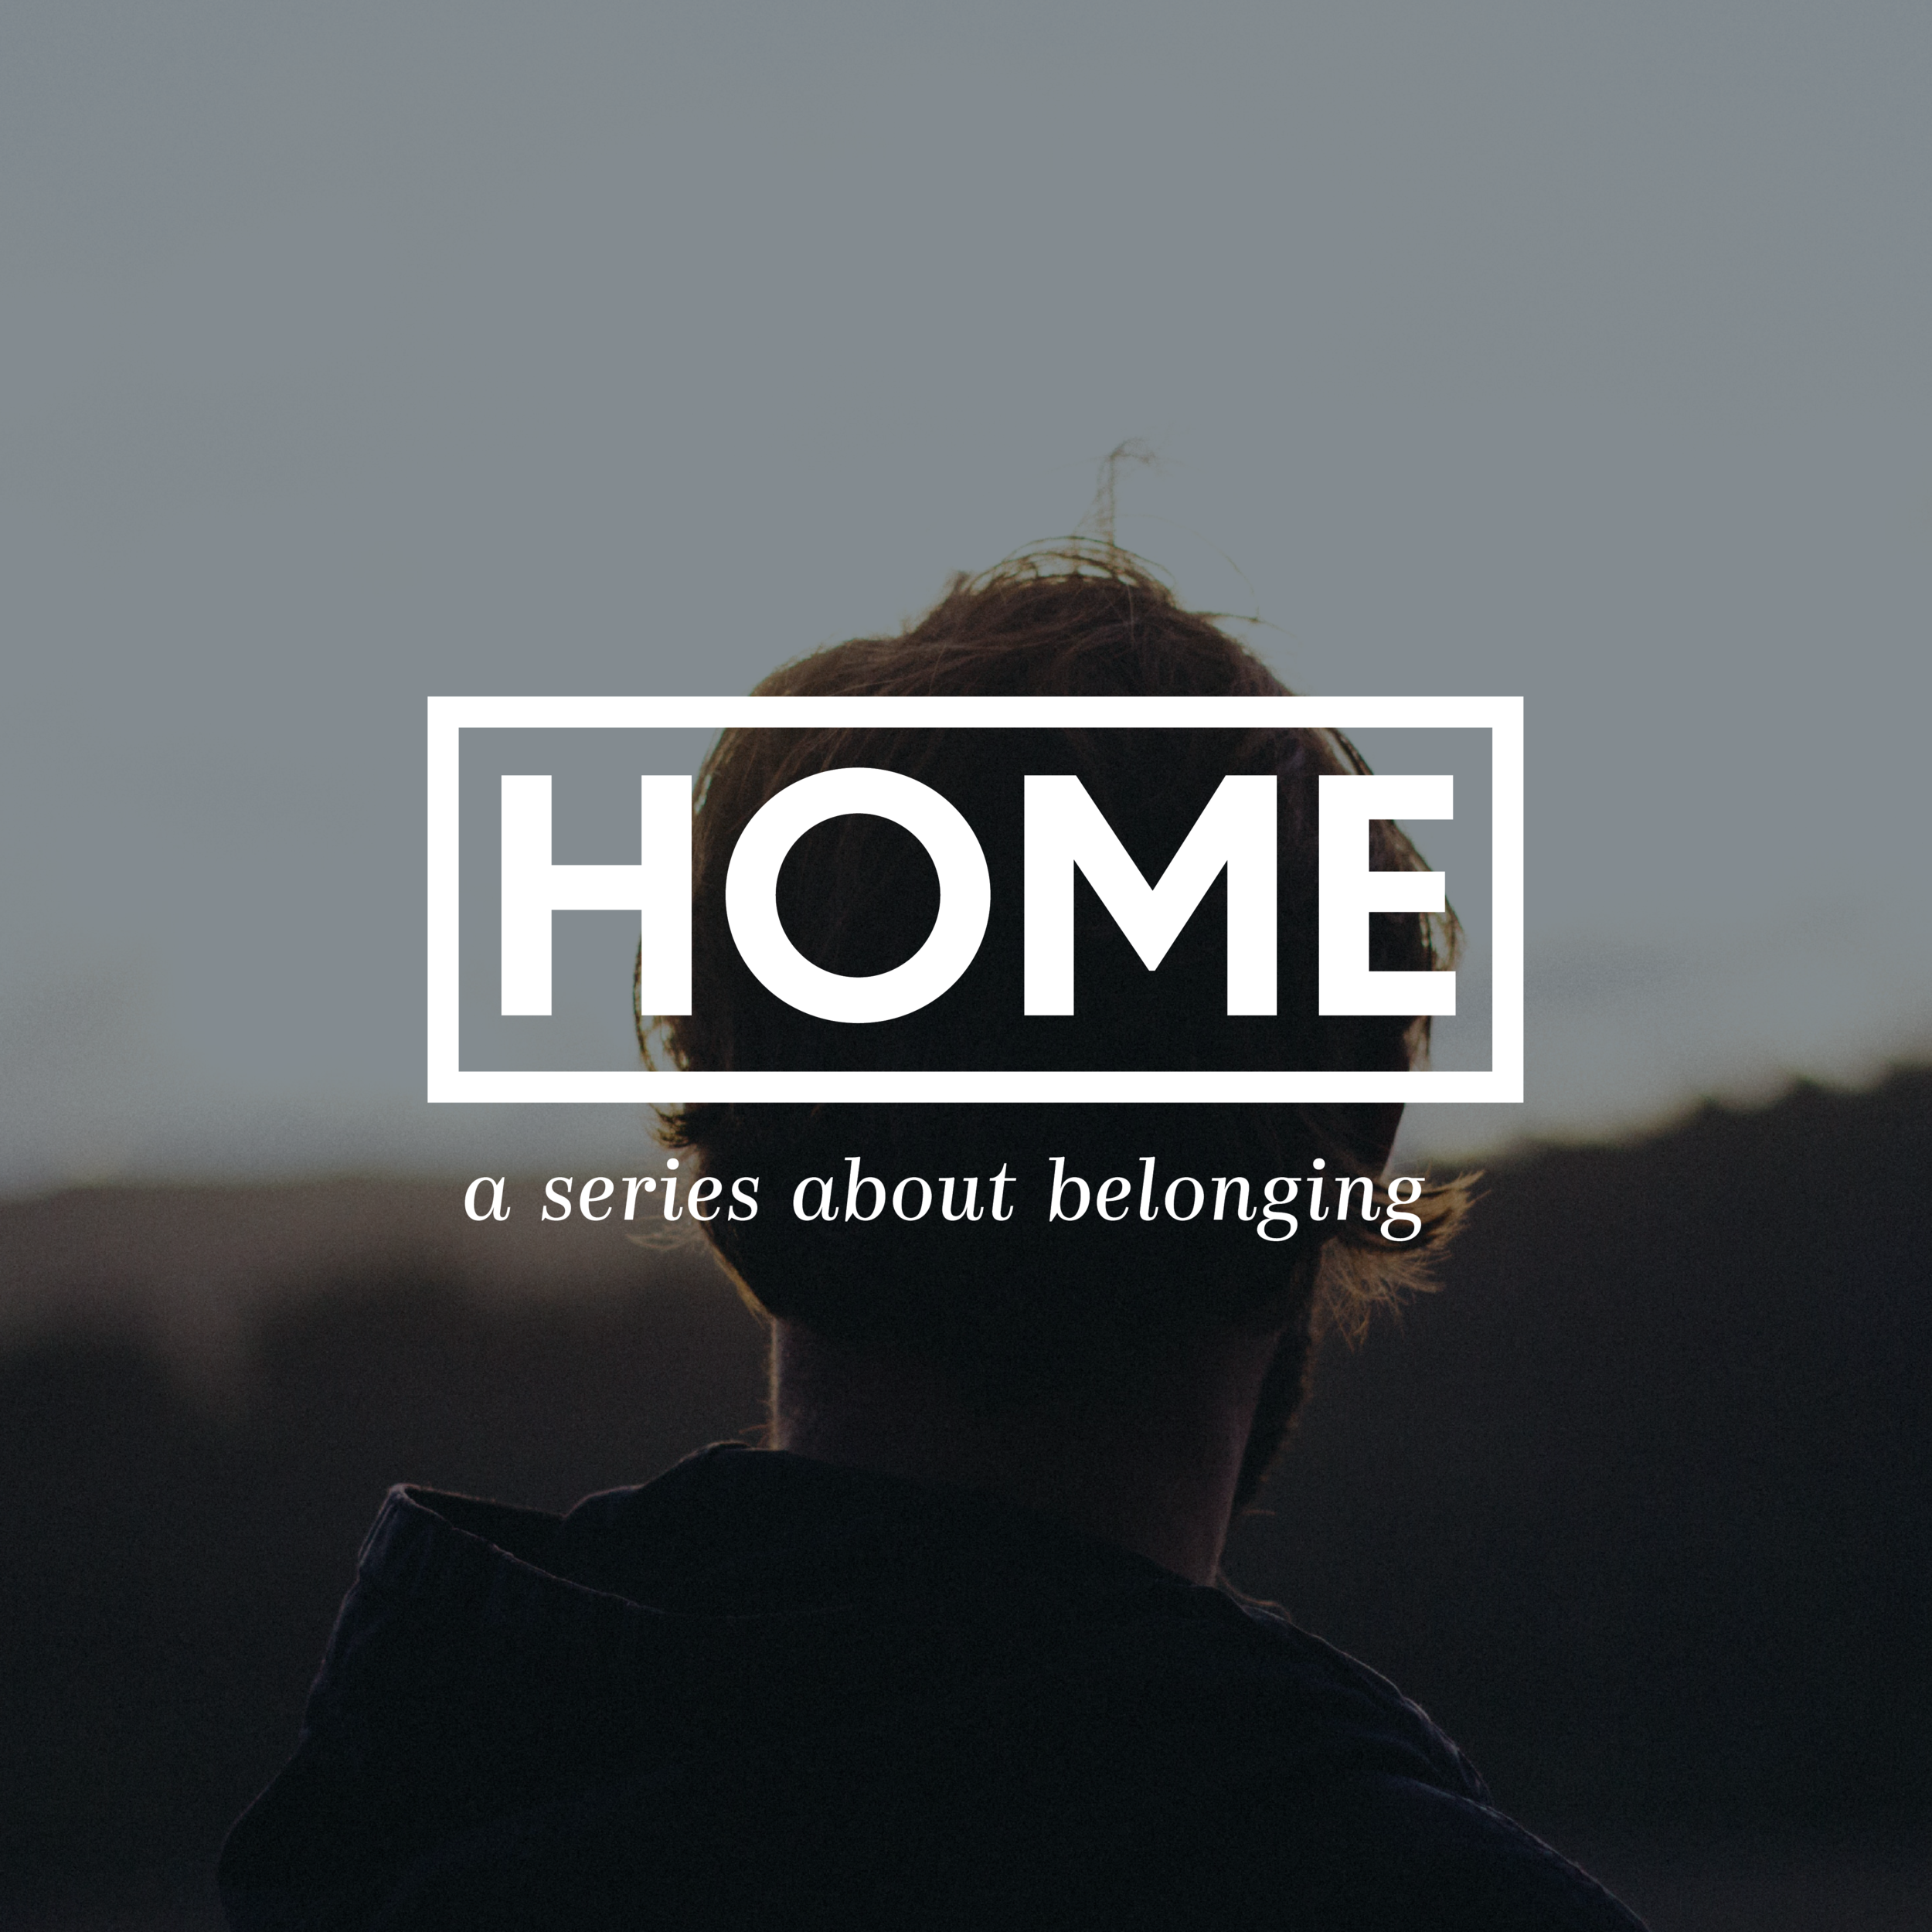 home-series